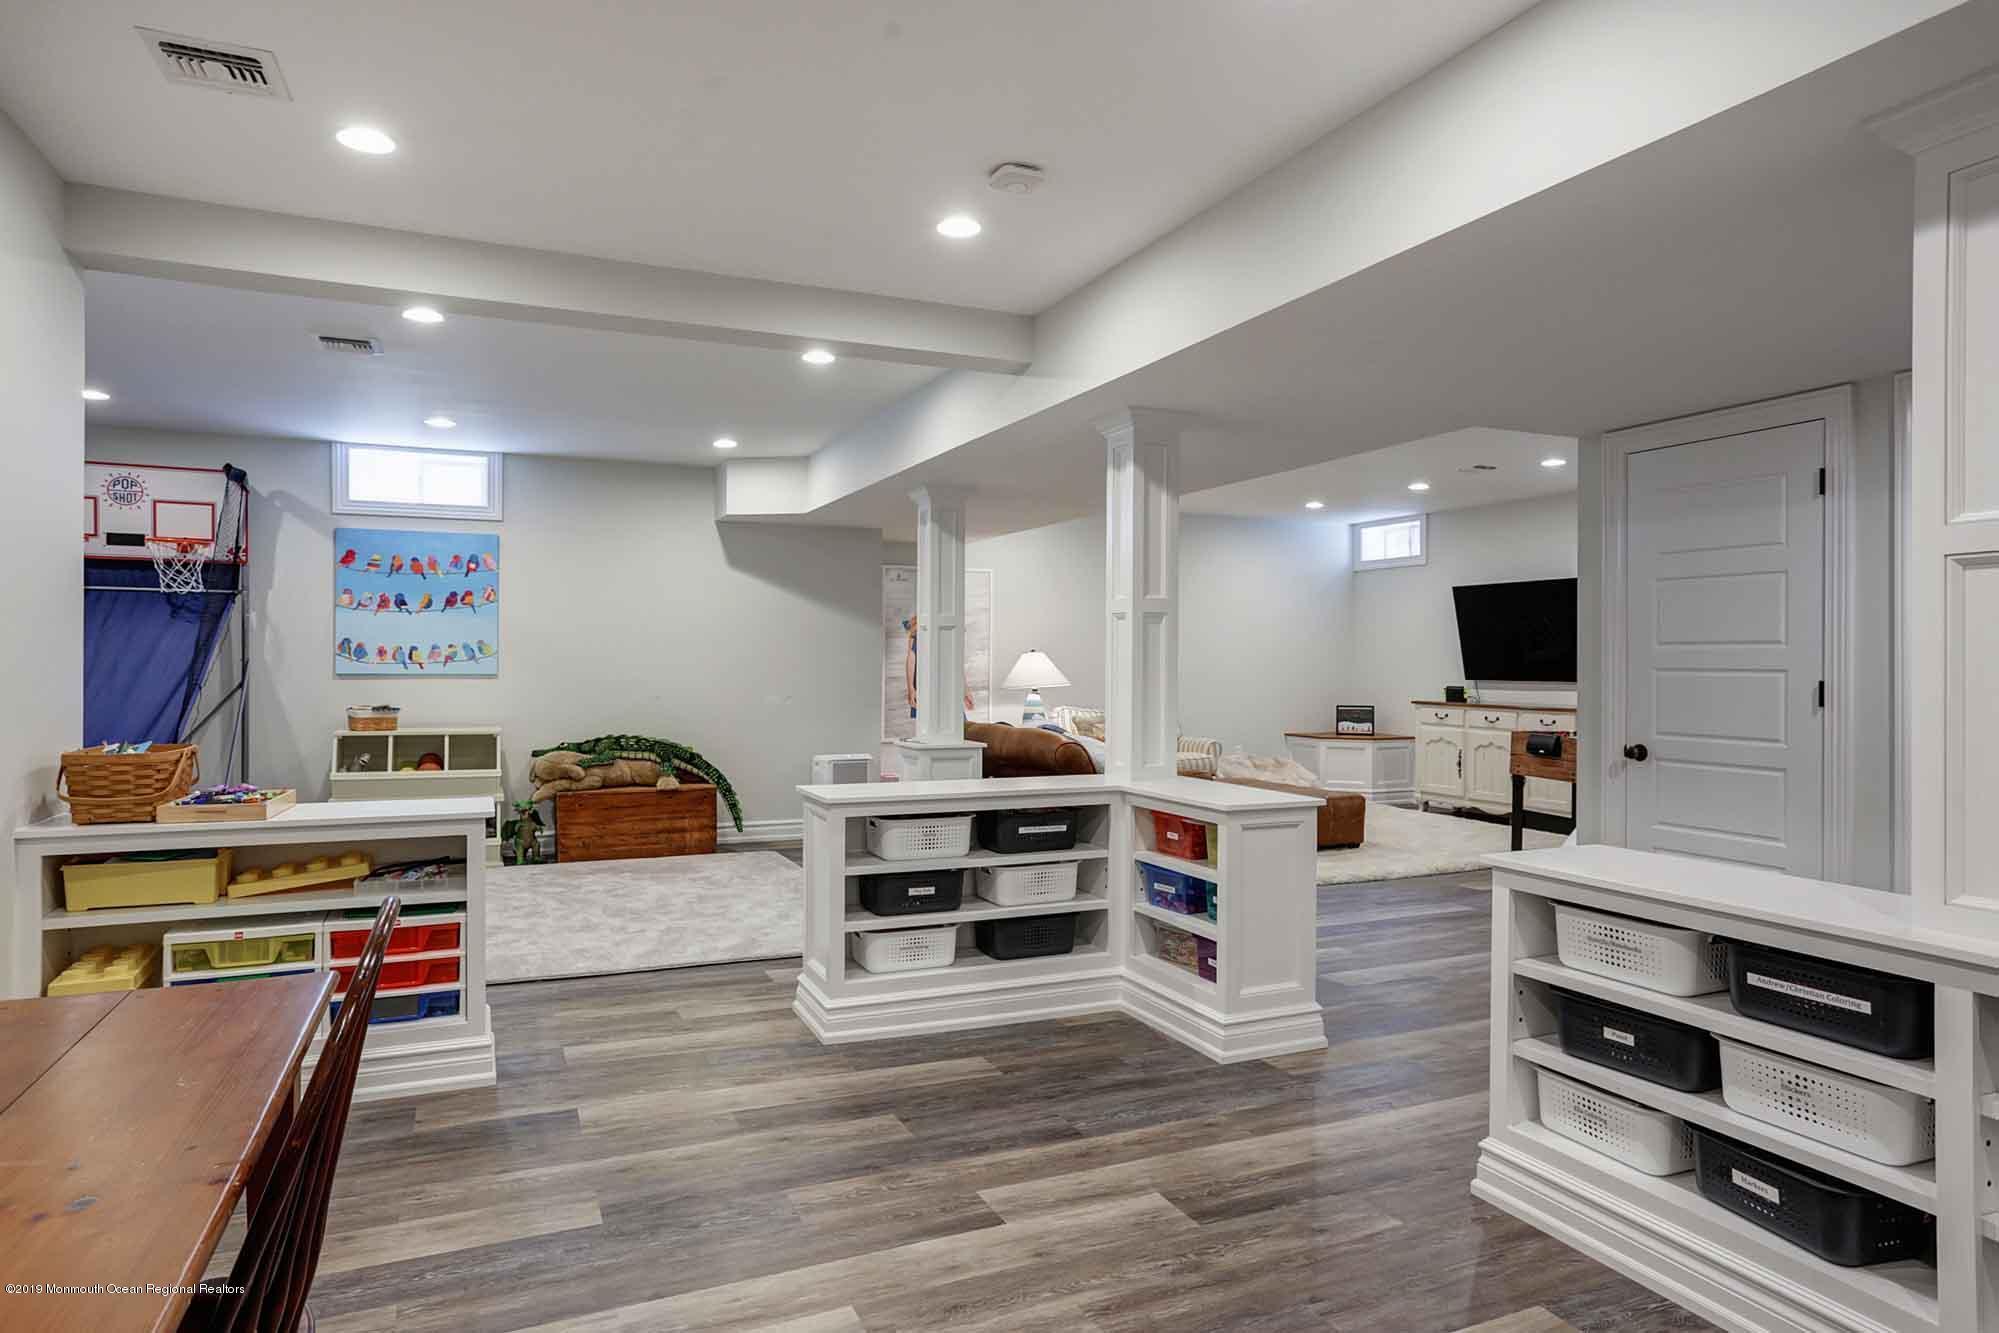 34 Park Avenue, Rumson, NJ 07760   Diane Turton, Realtors Rafter Spacing Holly Park Mobile Home on